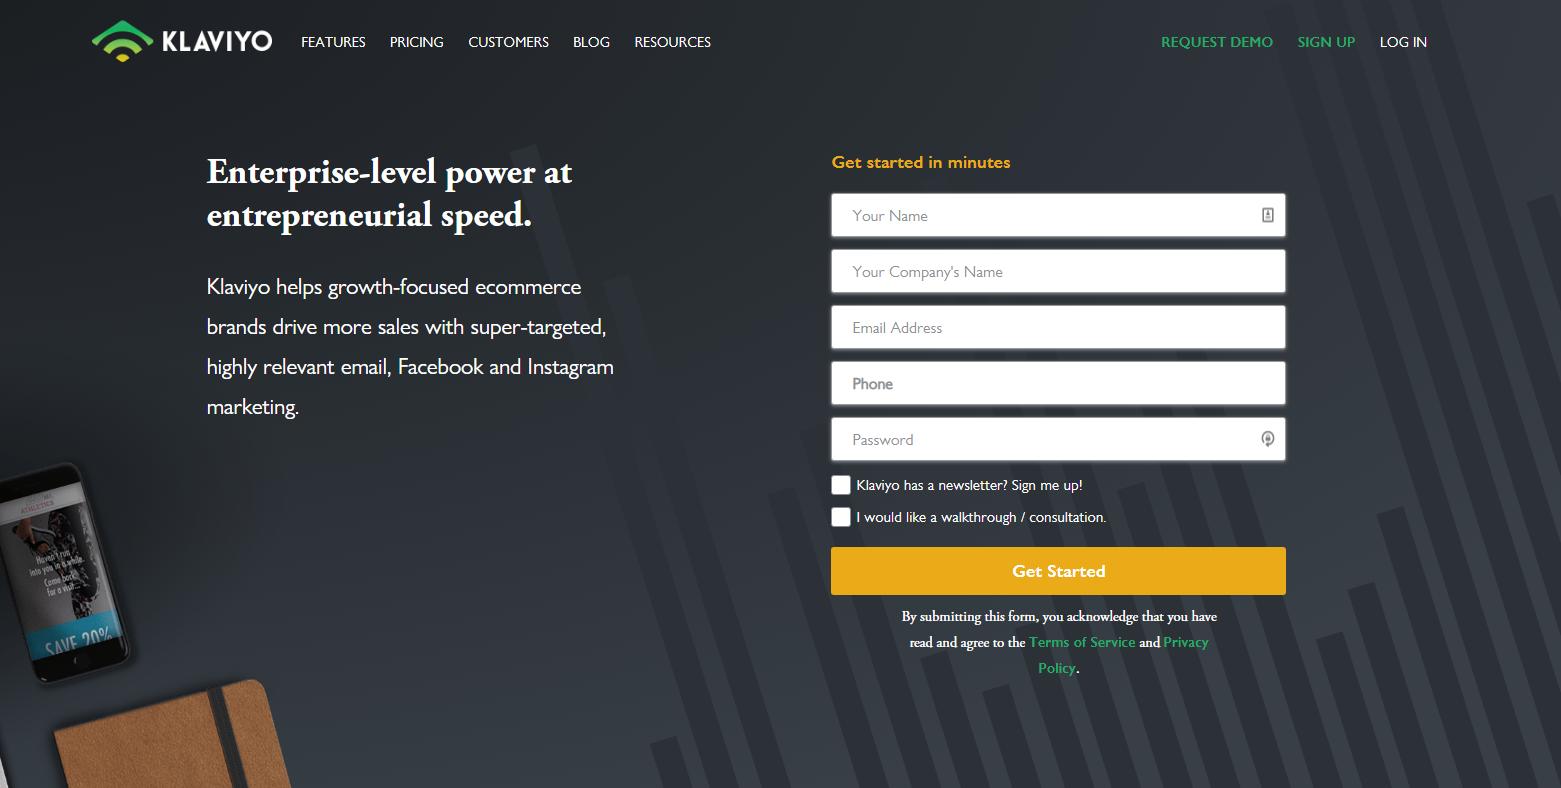 Klaviyo home page